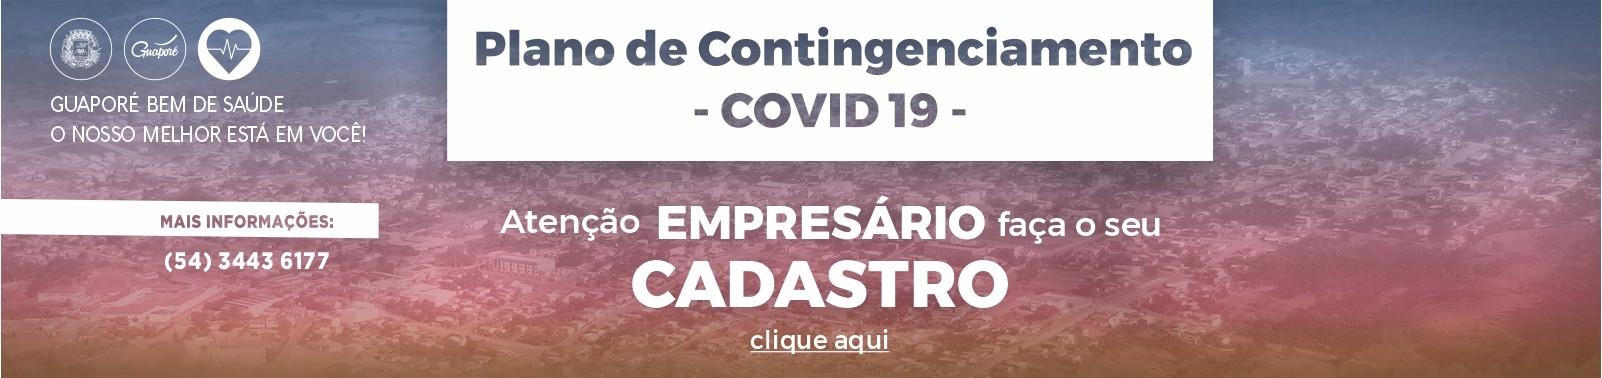 Banner 6 - Plano Contingenciamento - CADASTRAMENTO